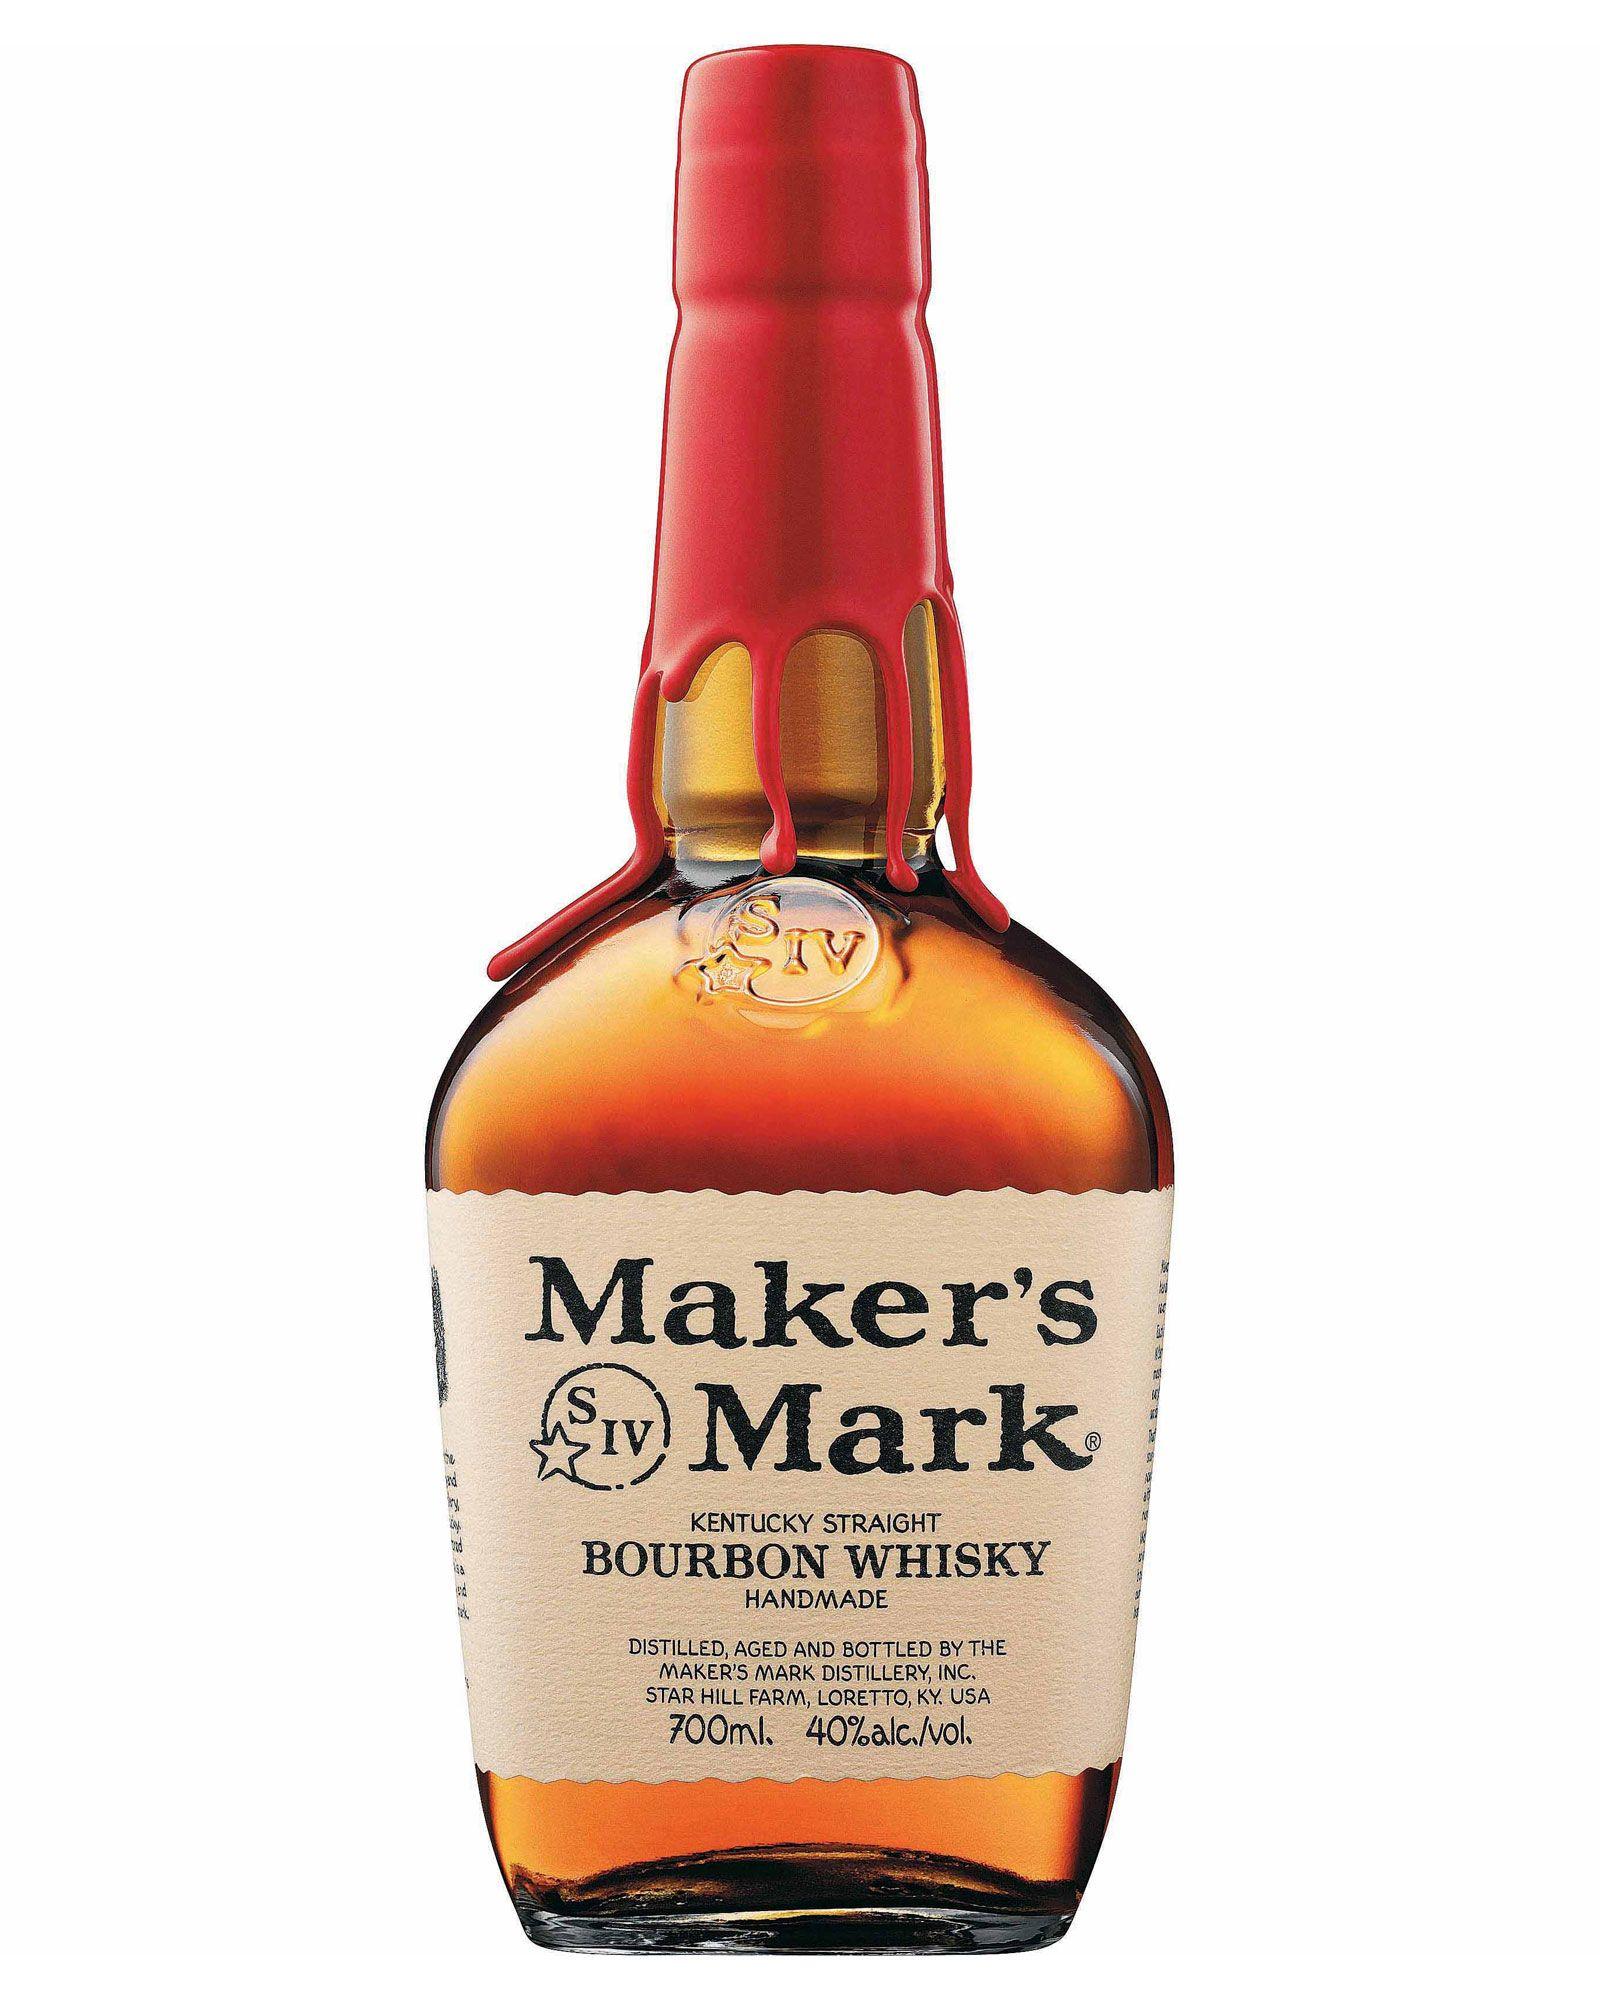 Maker S Mark Bourbon Whisky 700ml 53 99 Tipple Alcohol Delivery Kentucky Straight Bourbon Kentucky Bourbon Whisky Whisky